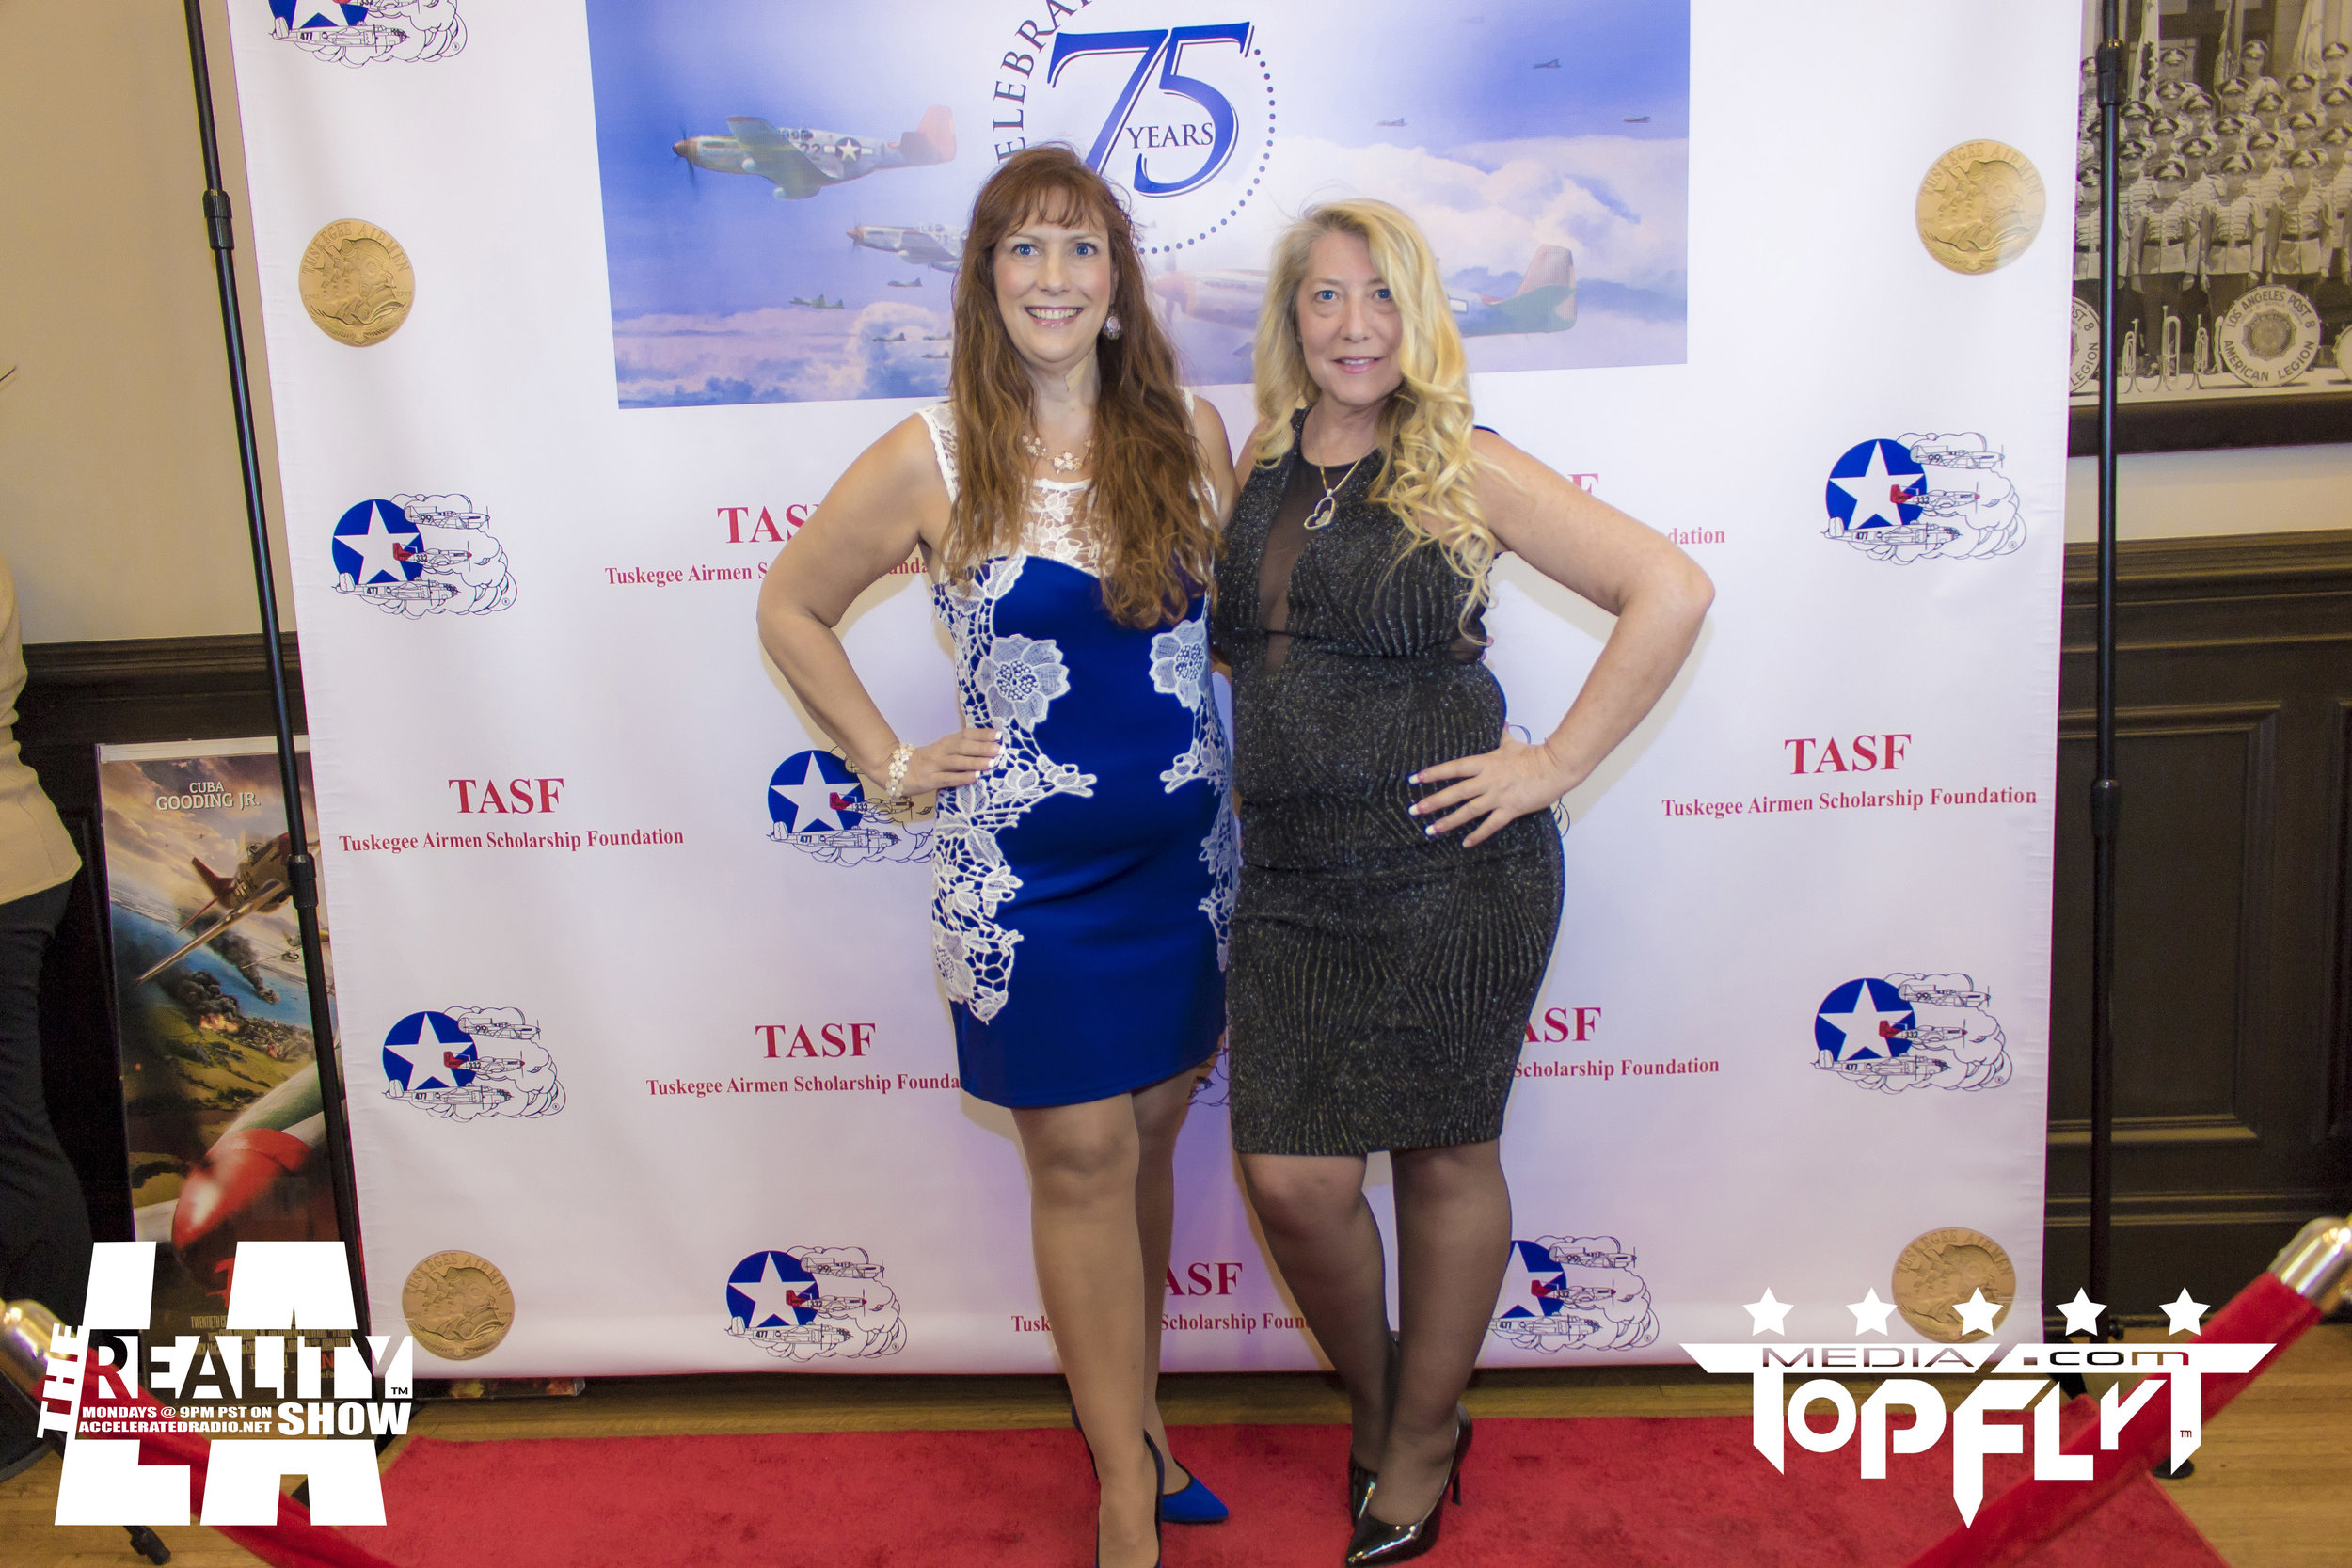 The Reality Show LA - Tuskegee Airmen 75th Anniversary VIP Reception_37.jpg